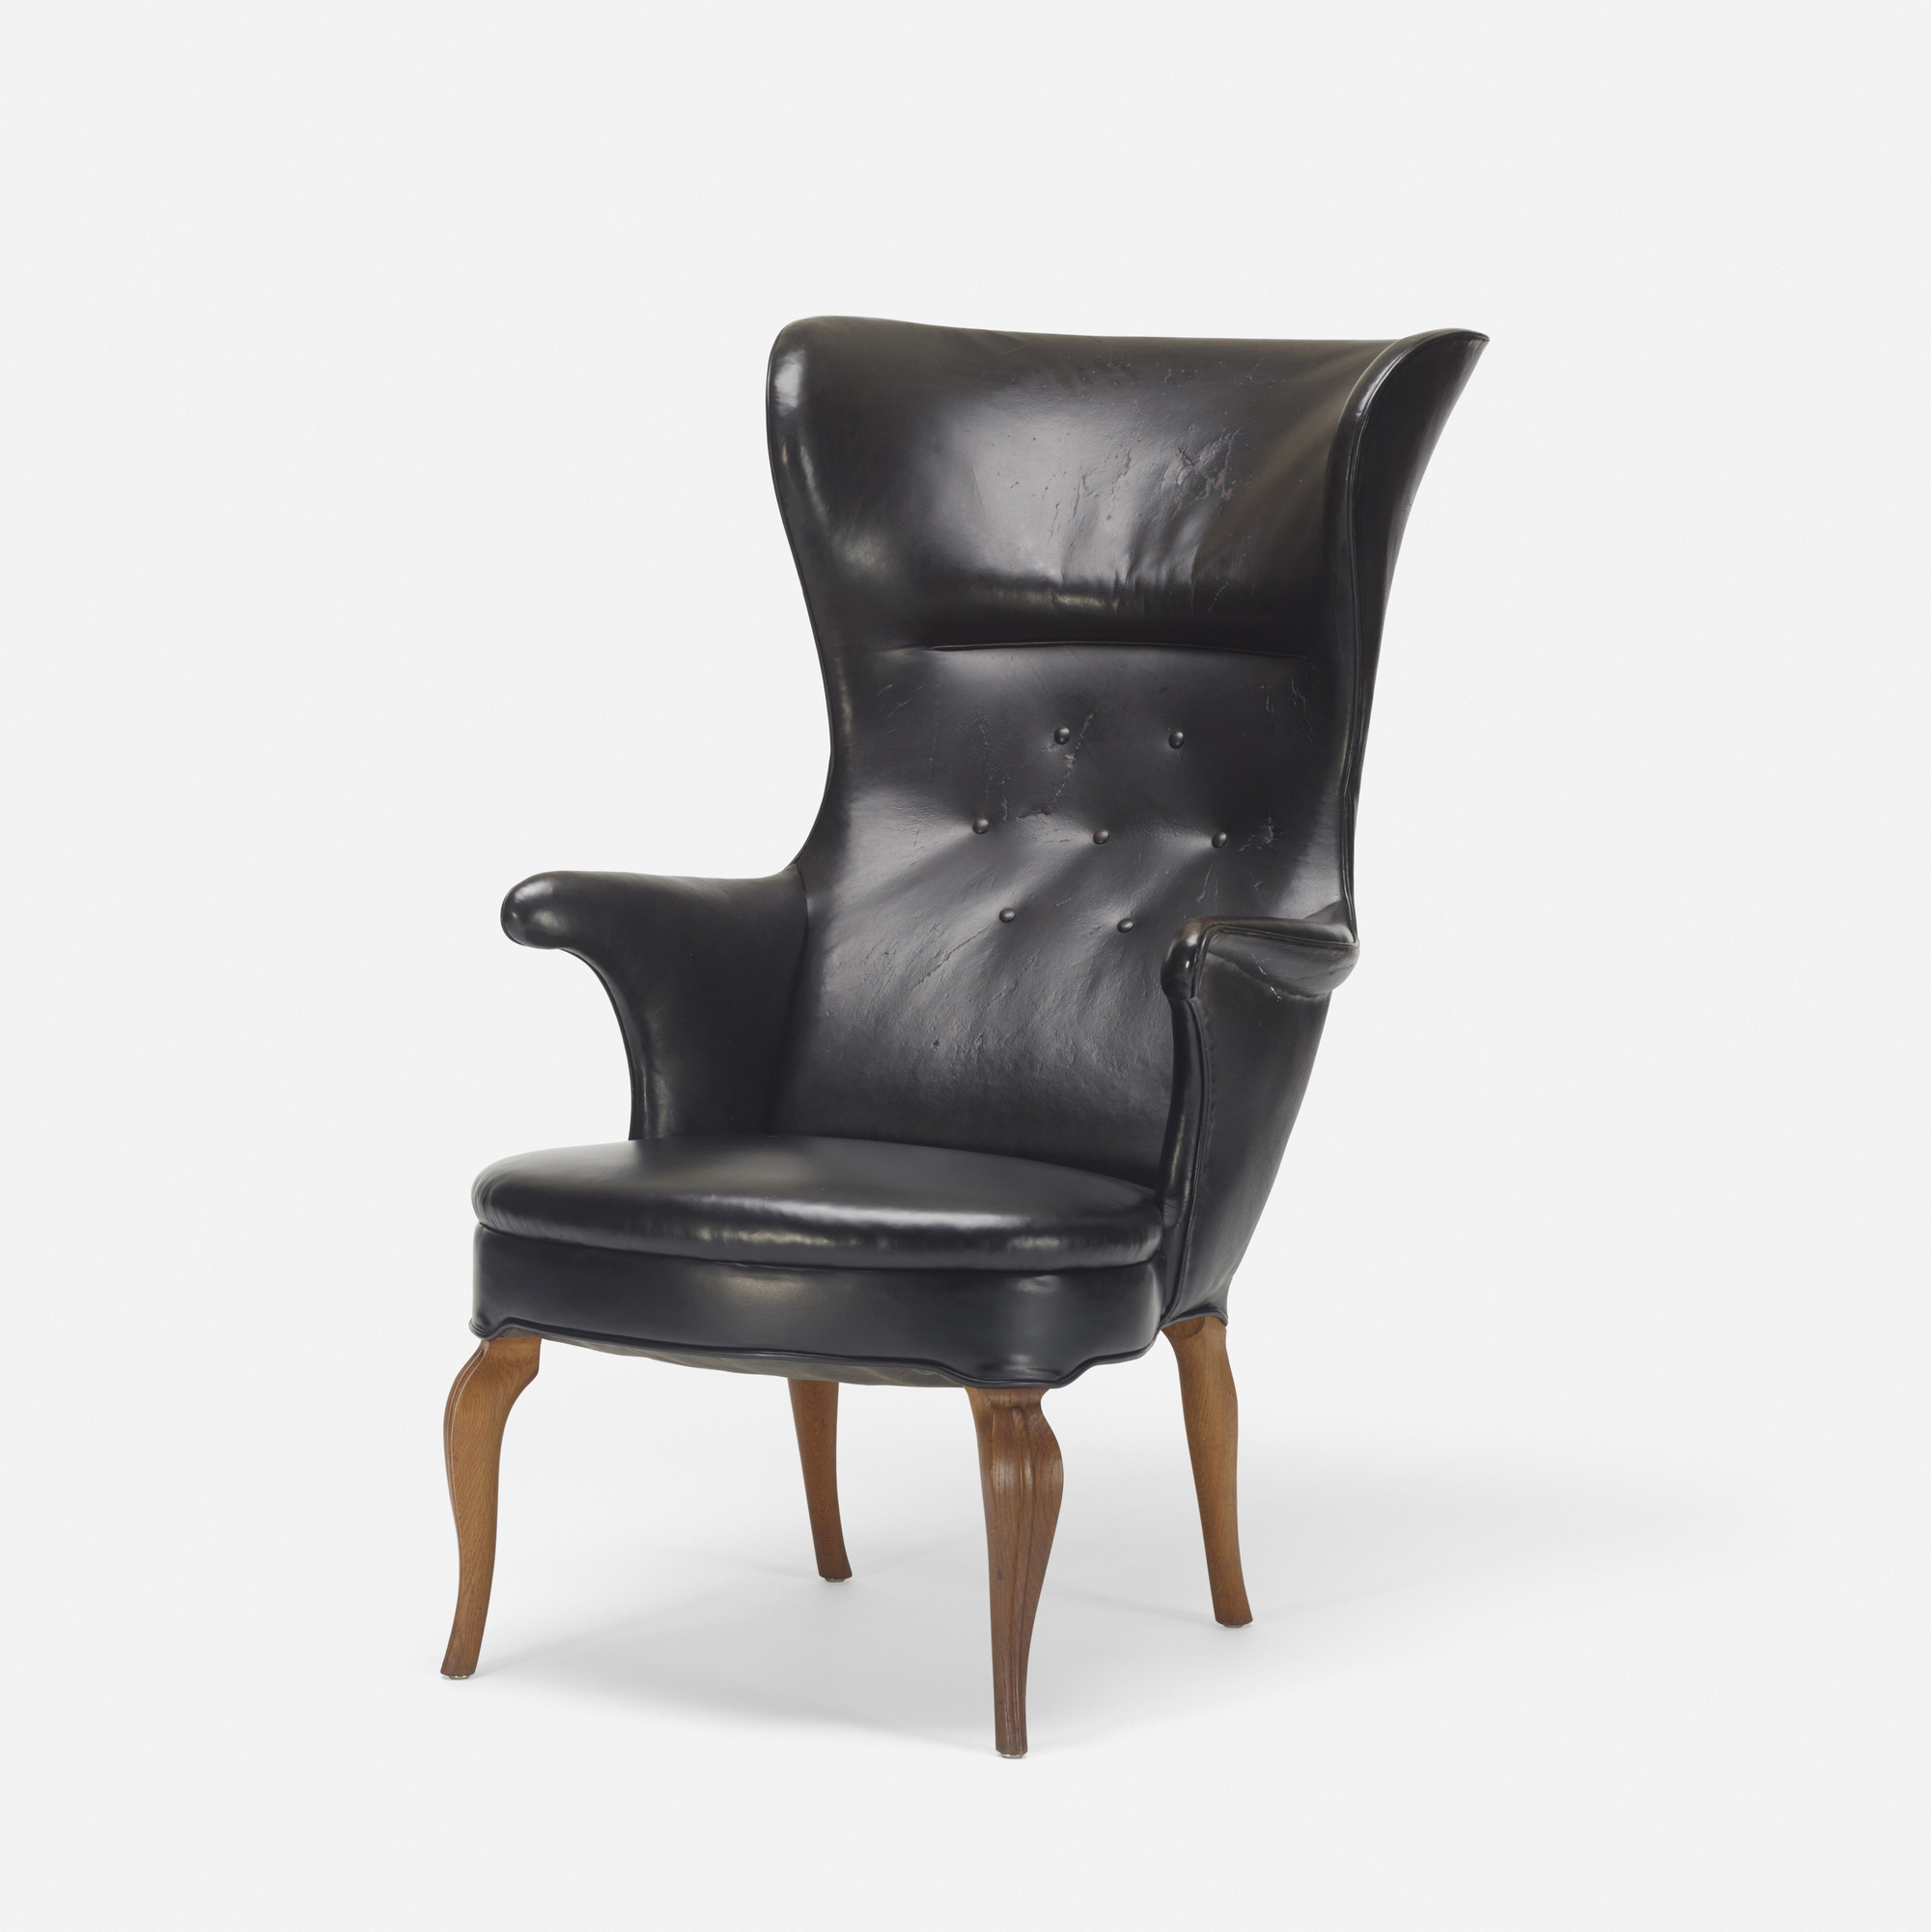 154 Frits Henningsen Wingback armchair Design 8 December